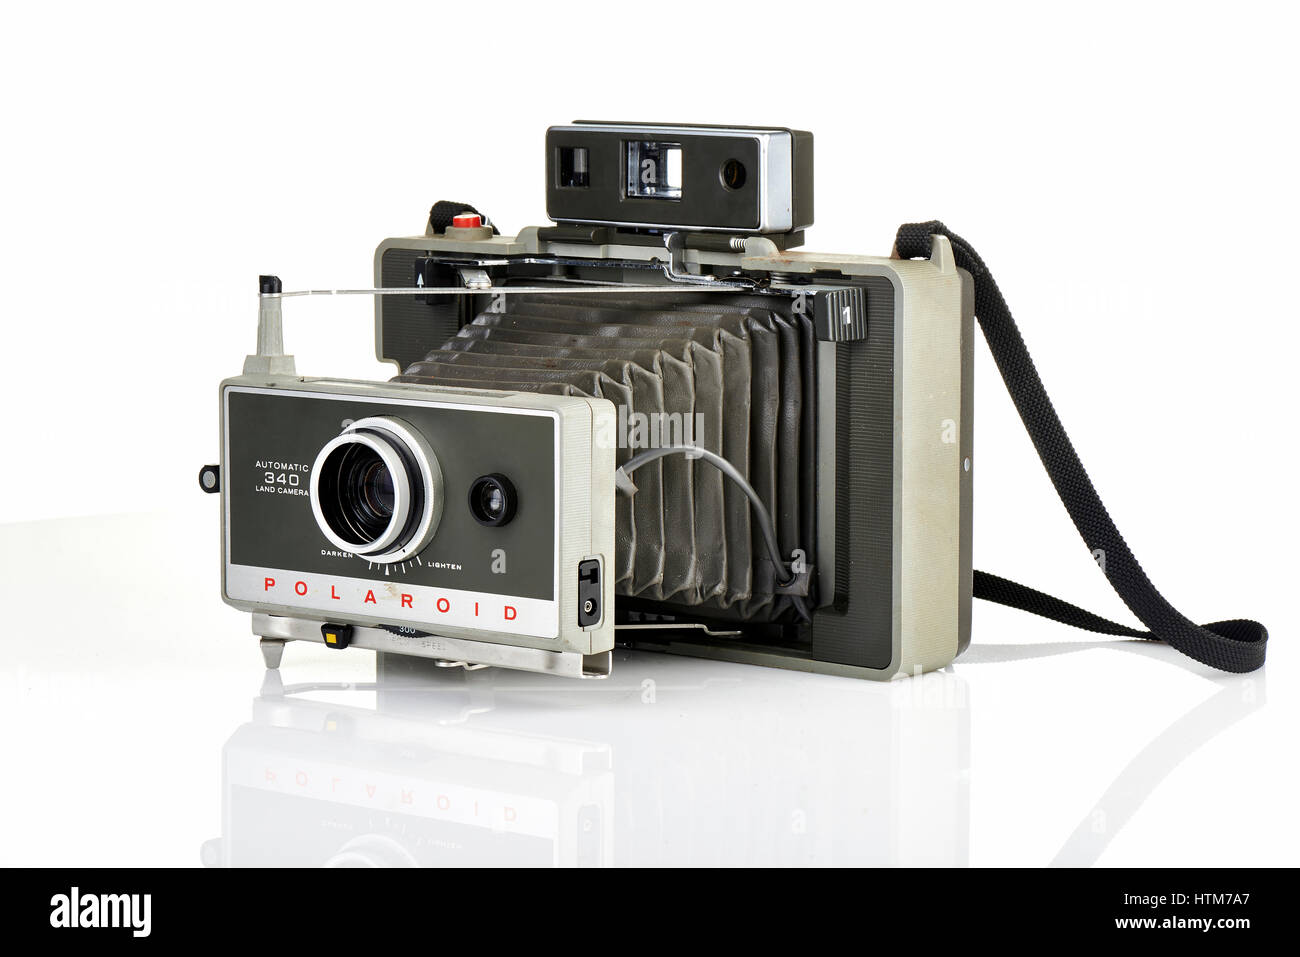 BRUSSELS,BELGIUM - FEBRUARY 03, 2014: Illustrative editorial of a Vintage Polaroid instant camera - Stock Image